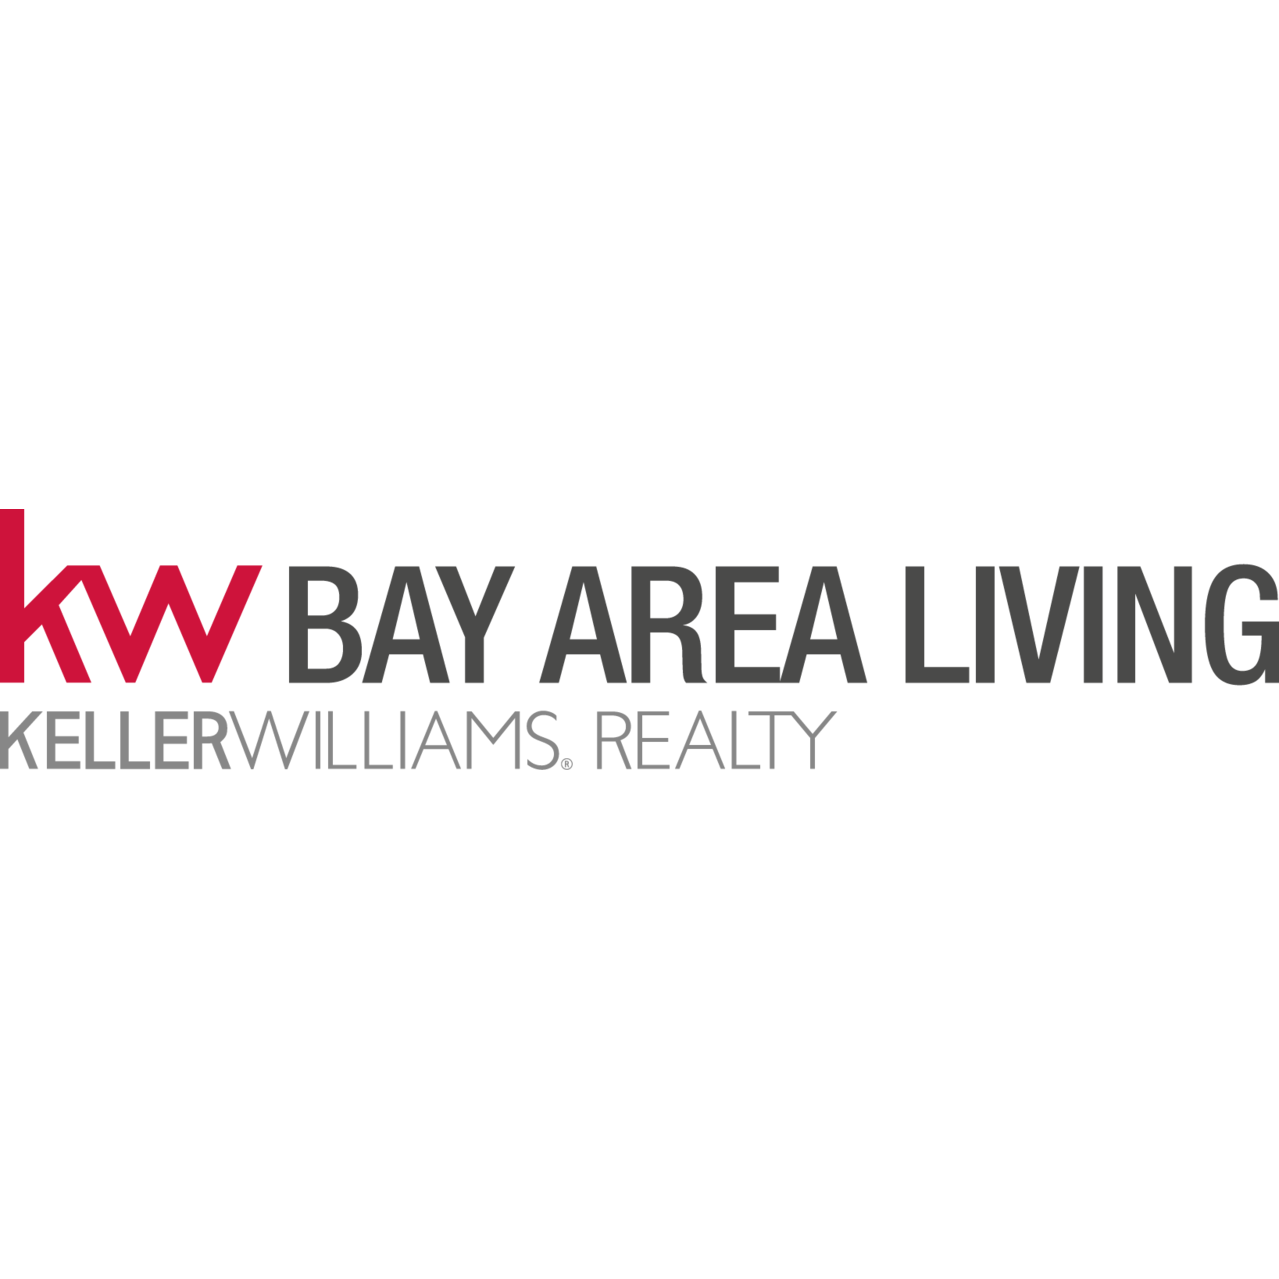 Pam Tyson, Keller Williams Bay Area Living